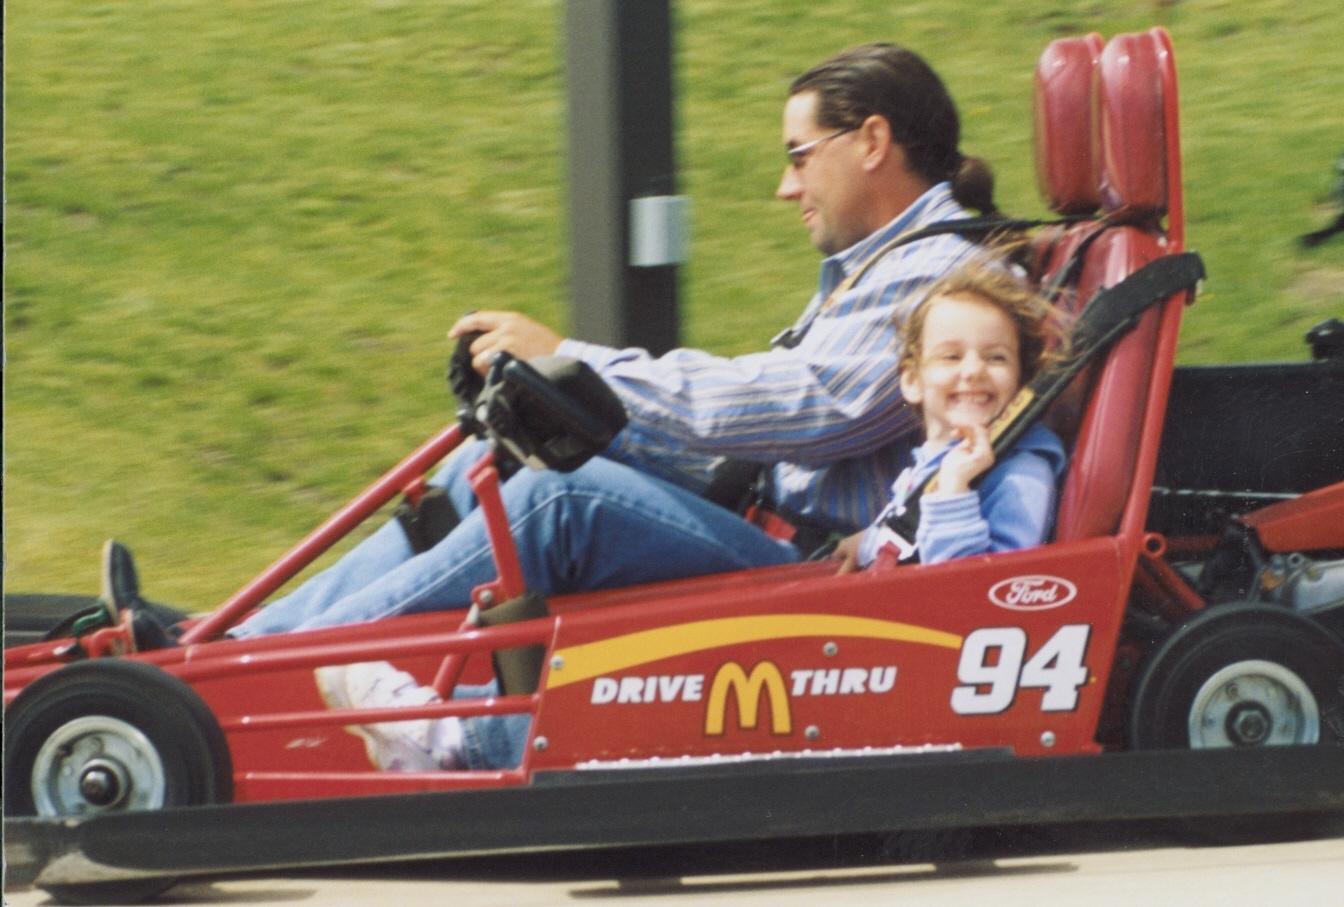 Sugar Grove Family Fun Center Go-Karts